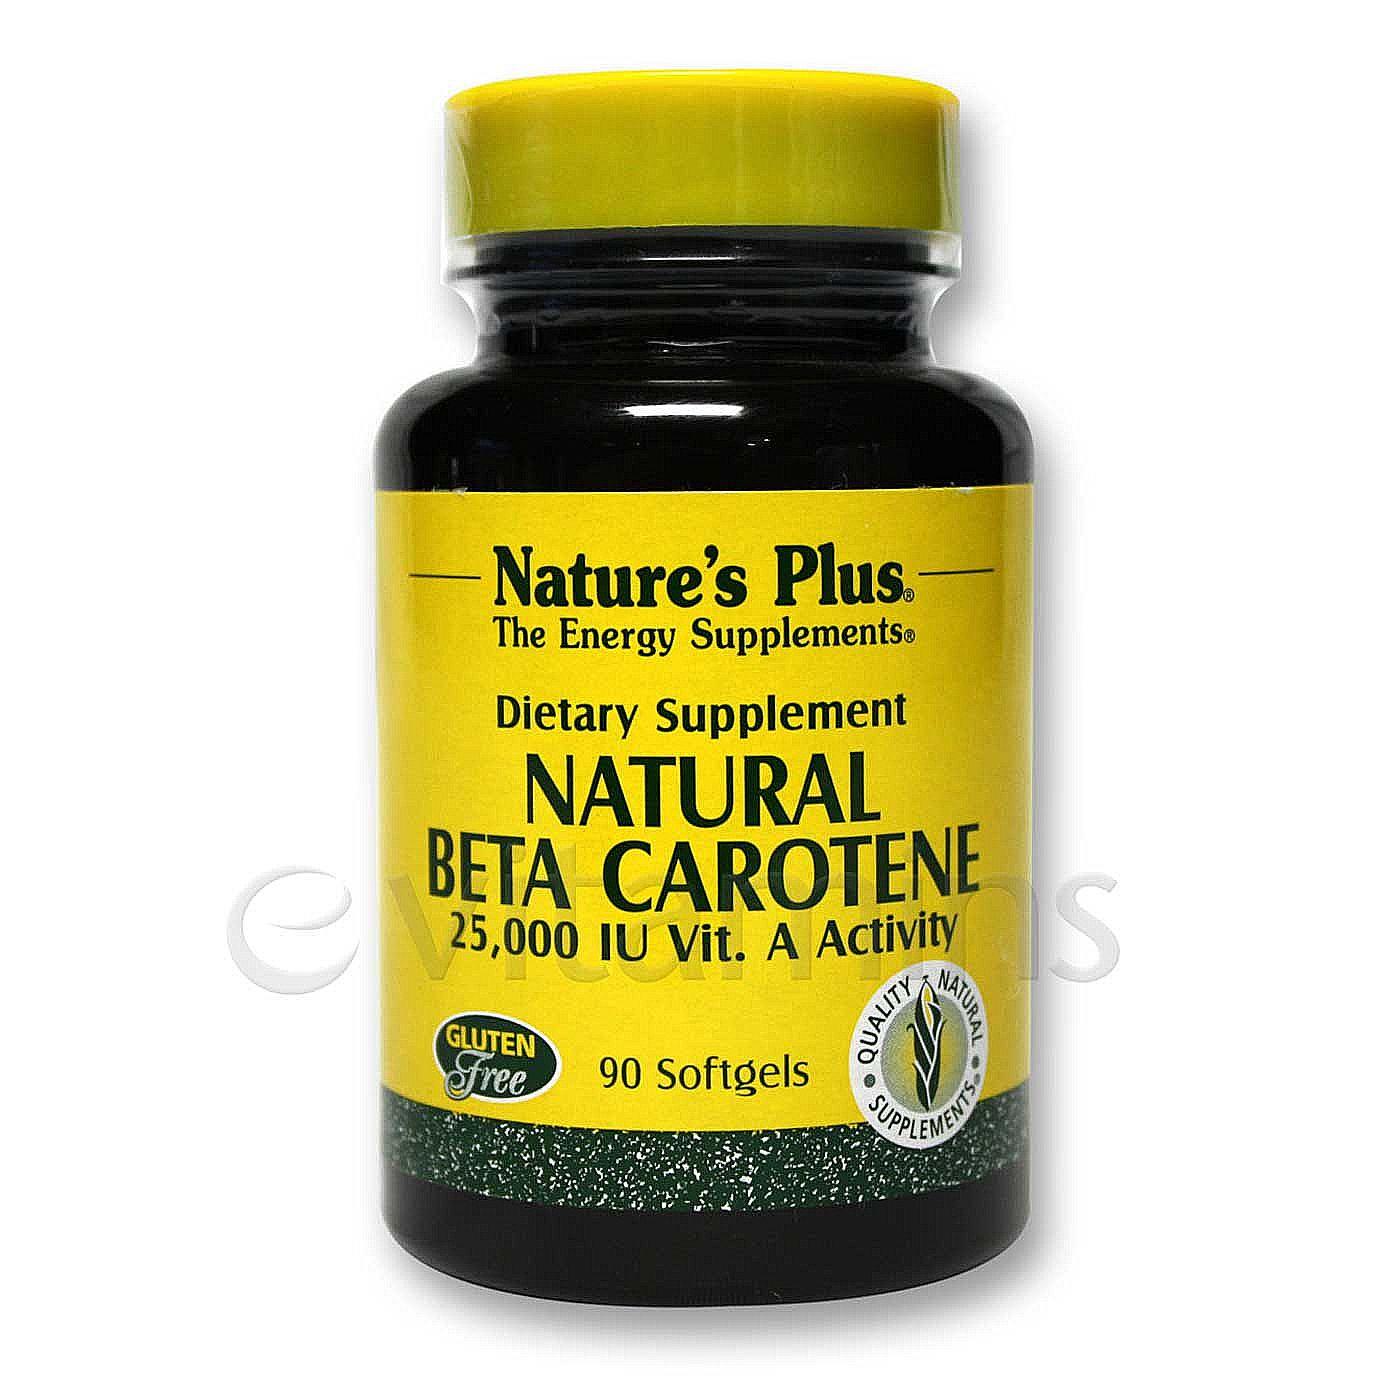 Beta-Carotene: Beneficial or Dangerous for Your Health?